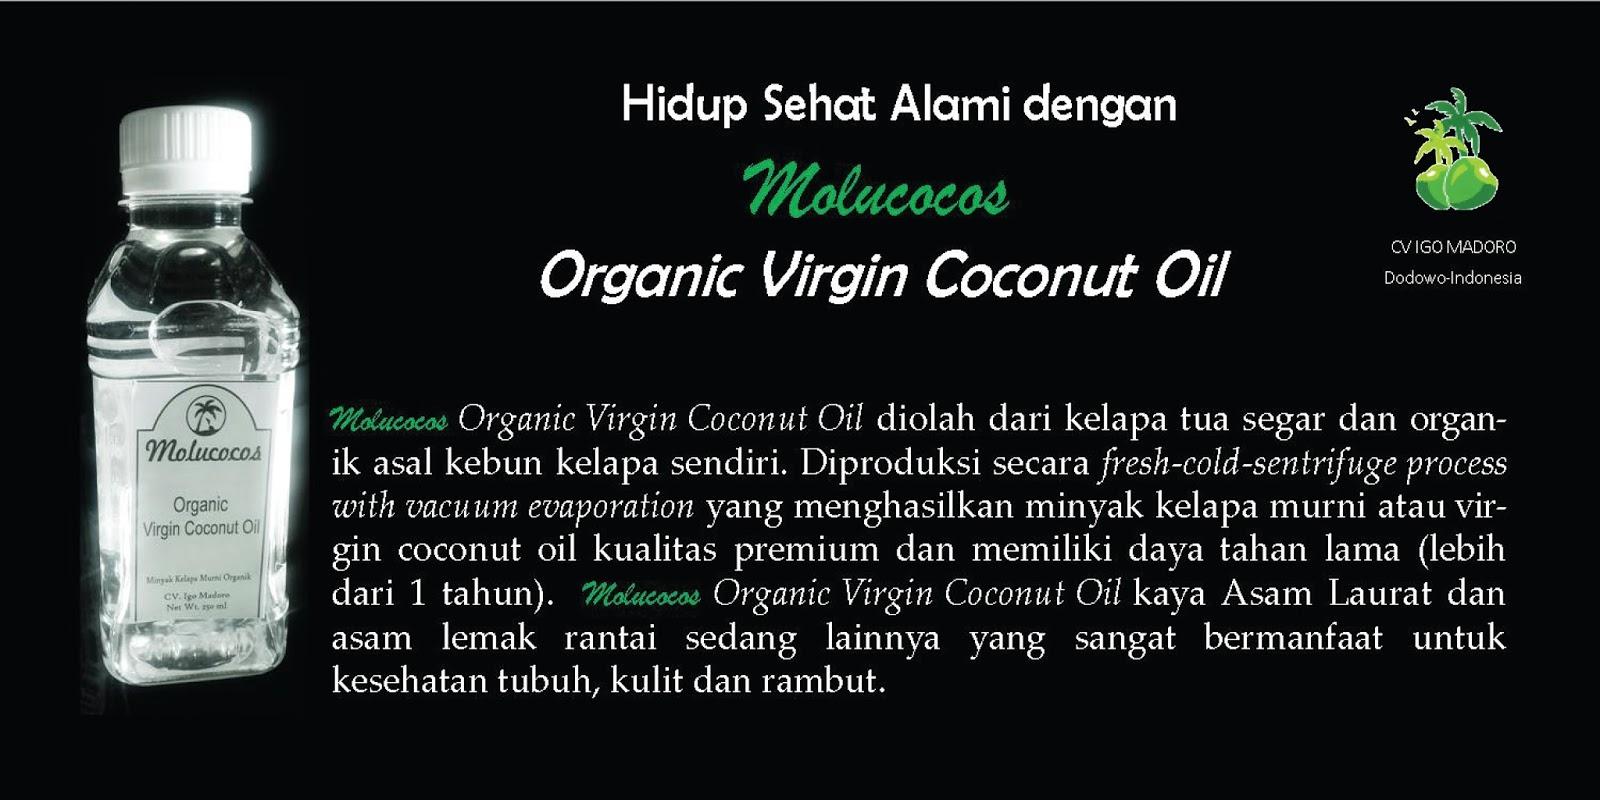 Harga Jual Vico Bagoes Virgin Coconut Oil Minyak Kelapa Vco 1 Liter By Asal Molucocos Organic Igo Madoro